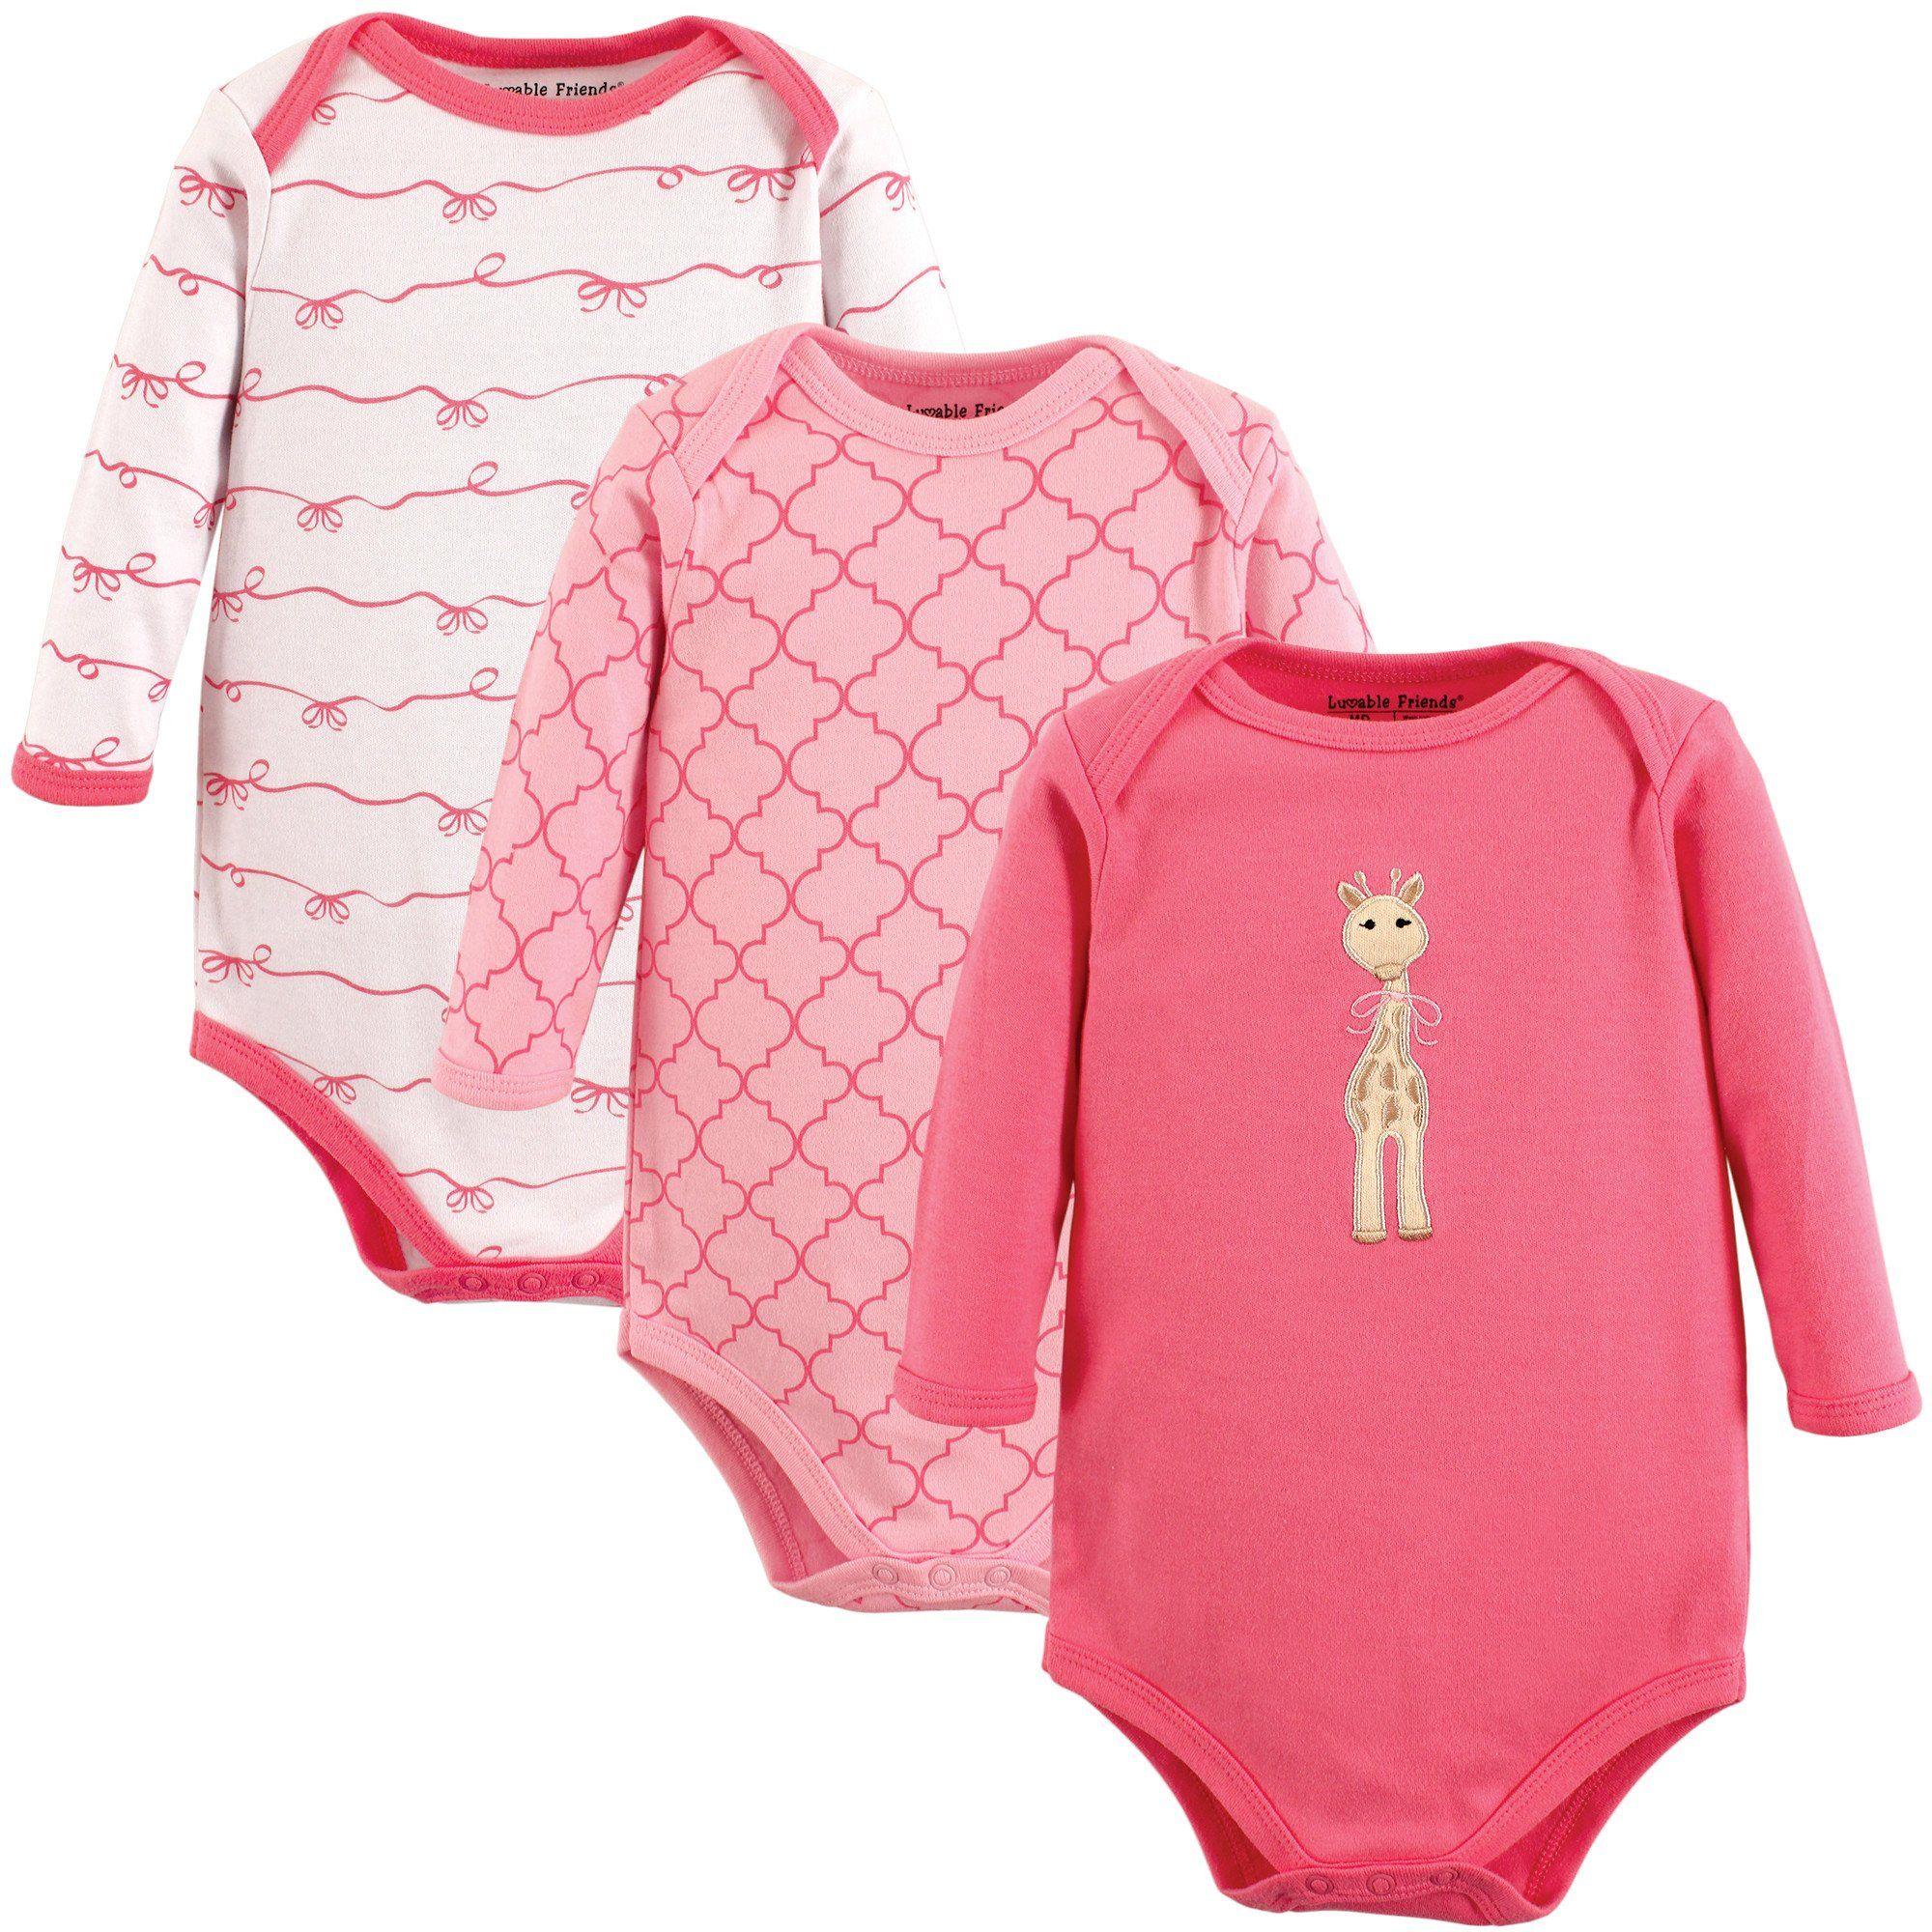 4b2c9866a3cd6 Luvable Friends Baby Long Sleeve Bodysuit 3 Pack